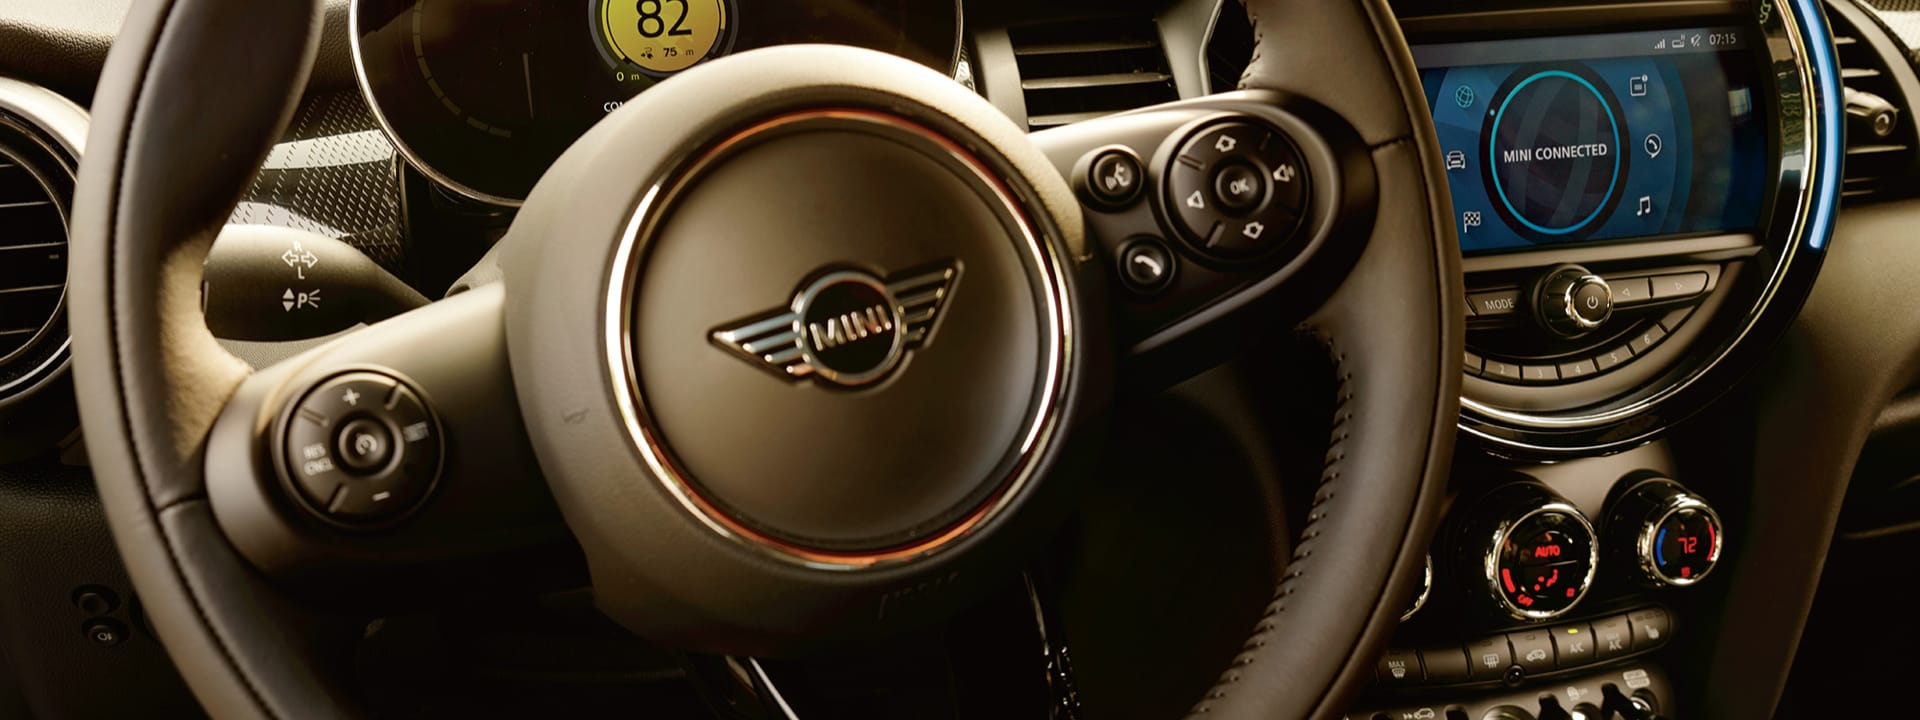 MINI Electric Hardtop 2 Door – steering wheel and dashboard